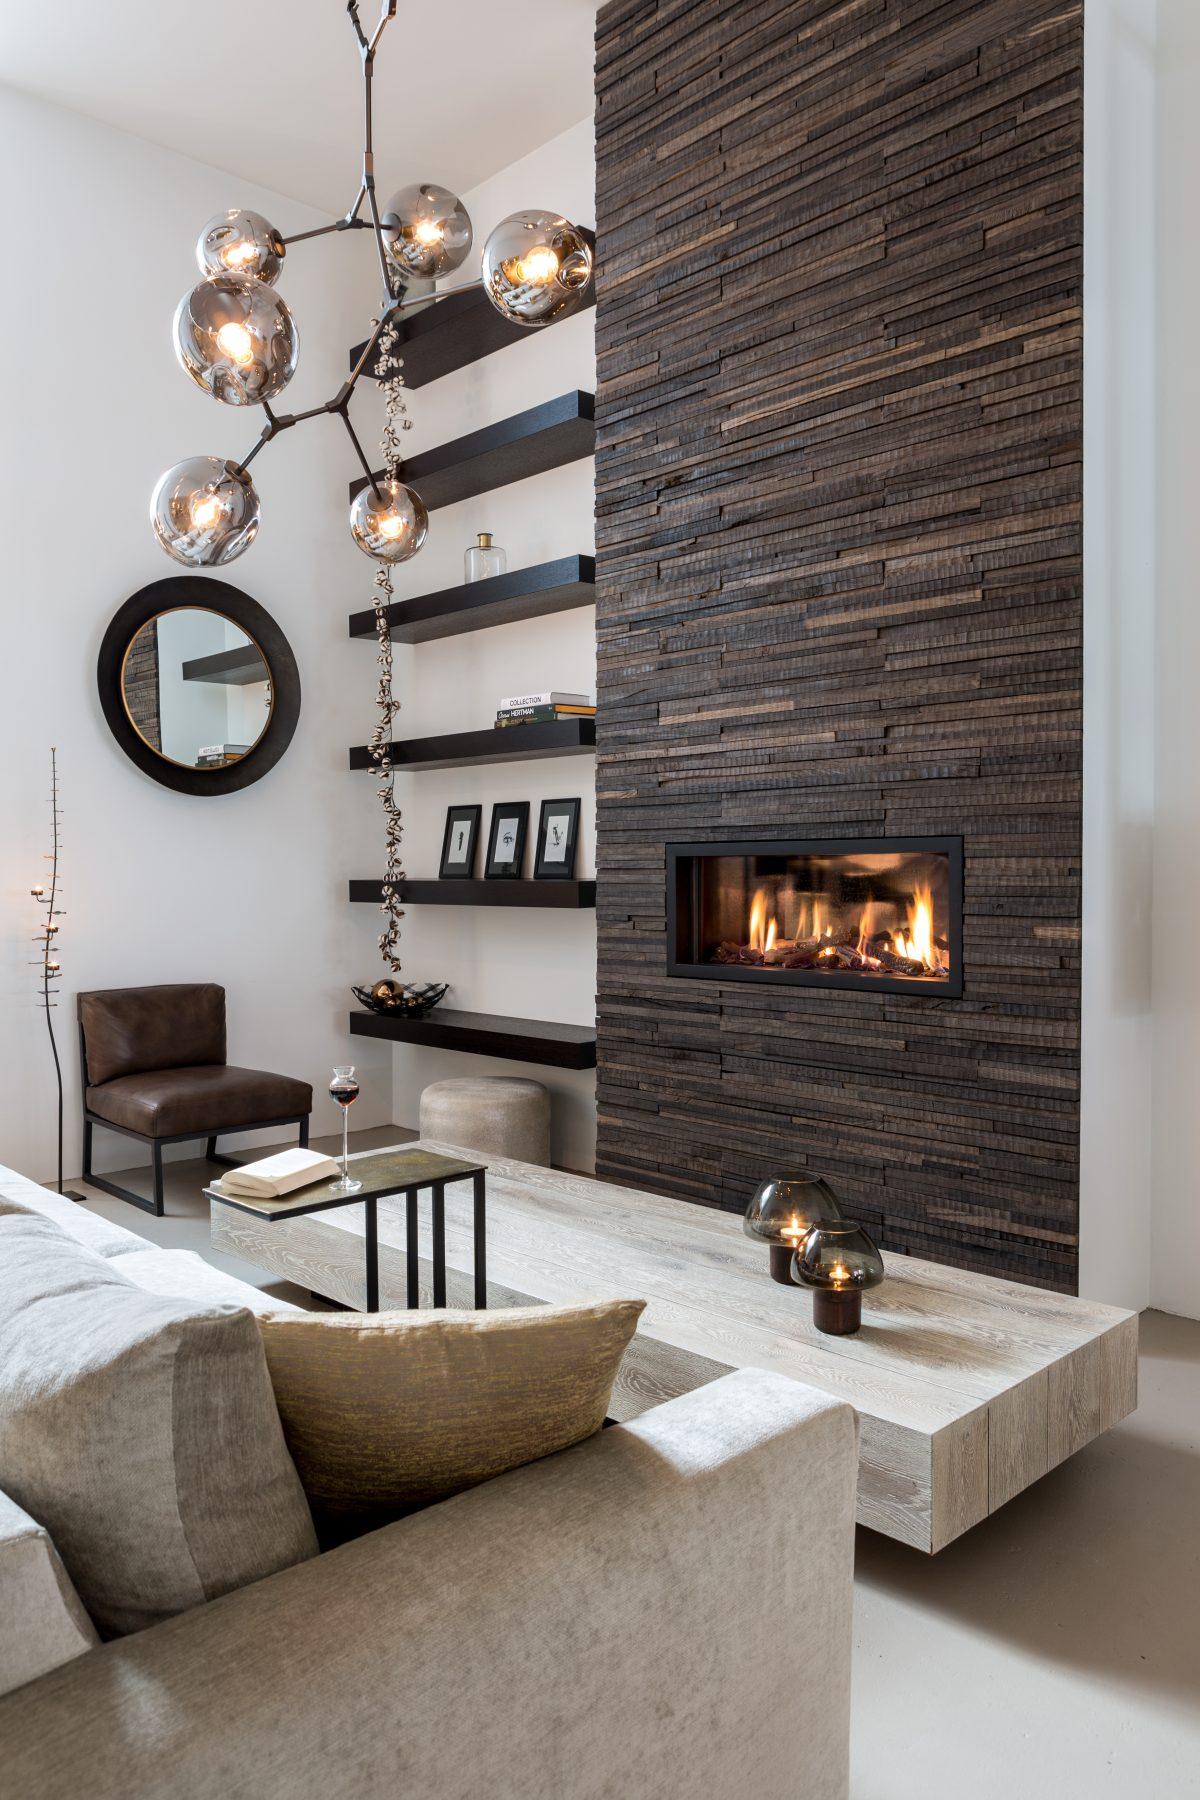 wonderwall studios. Black Bedroom Furniture Sets. Home Design Ideas